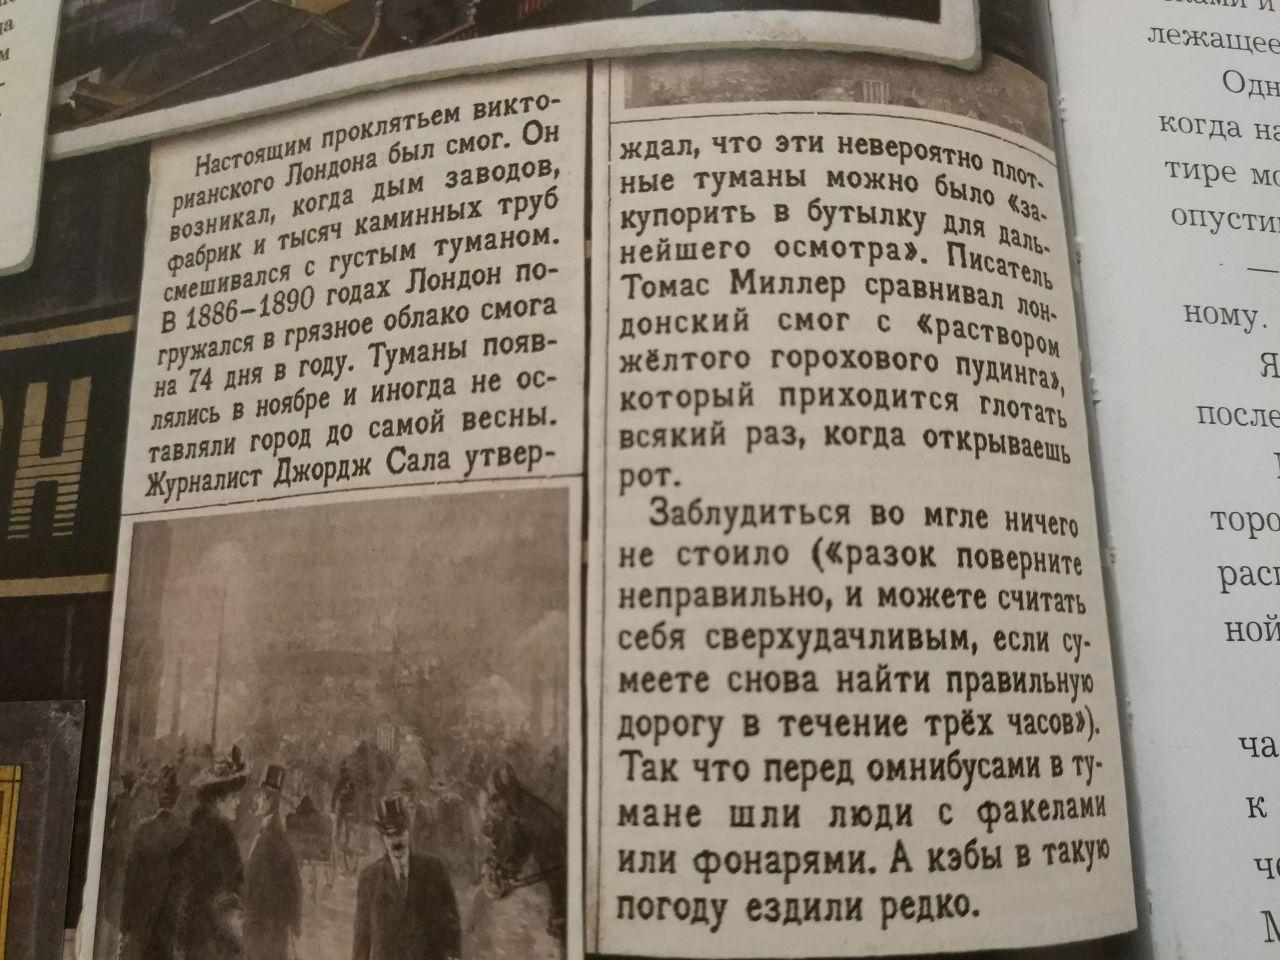 http://s3.uploads.ru/Gxlom.jpg